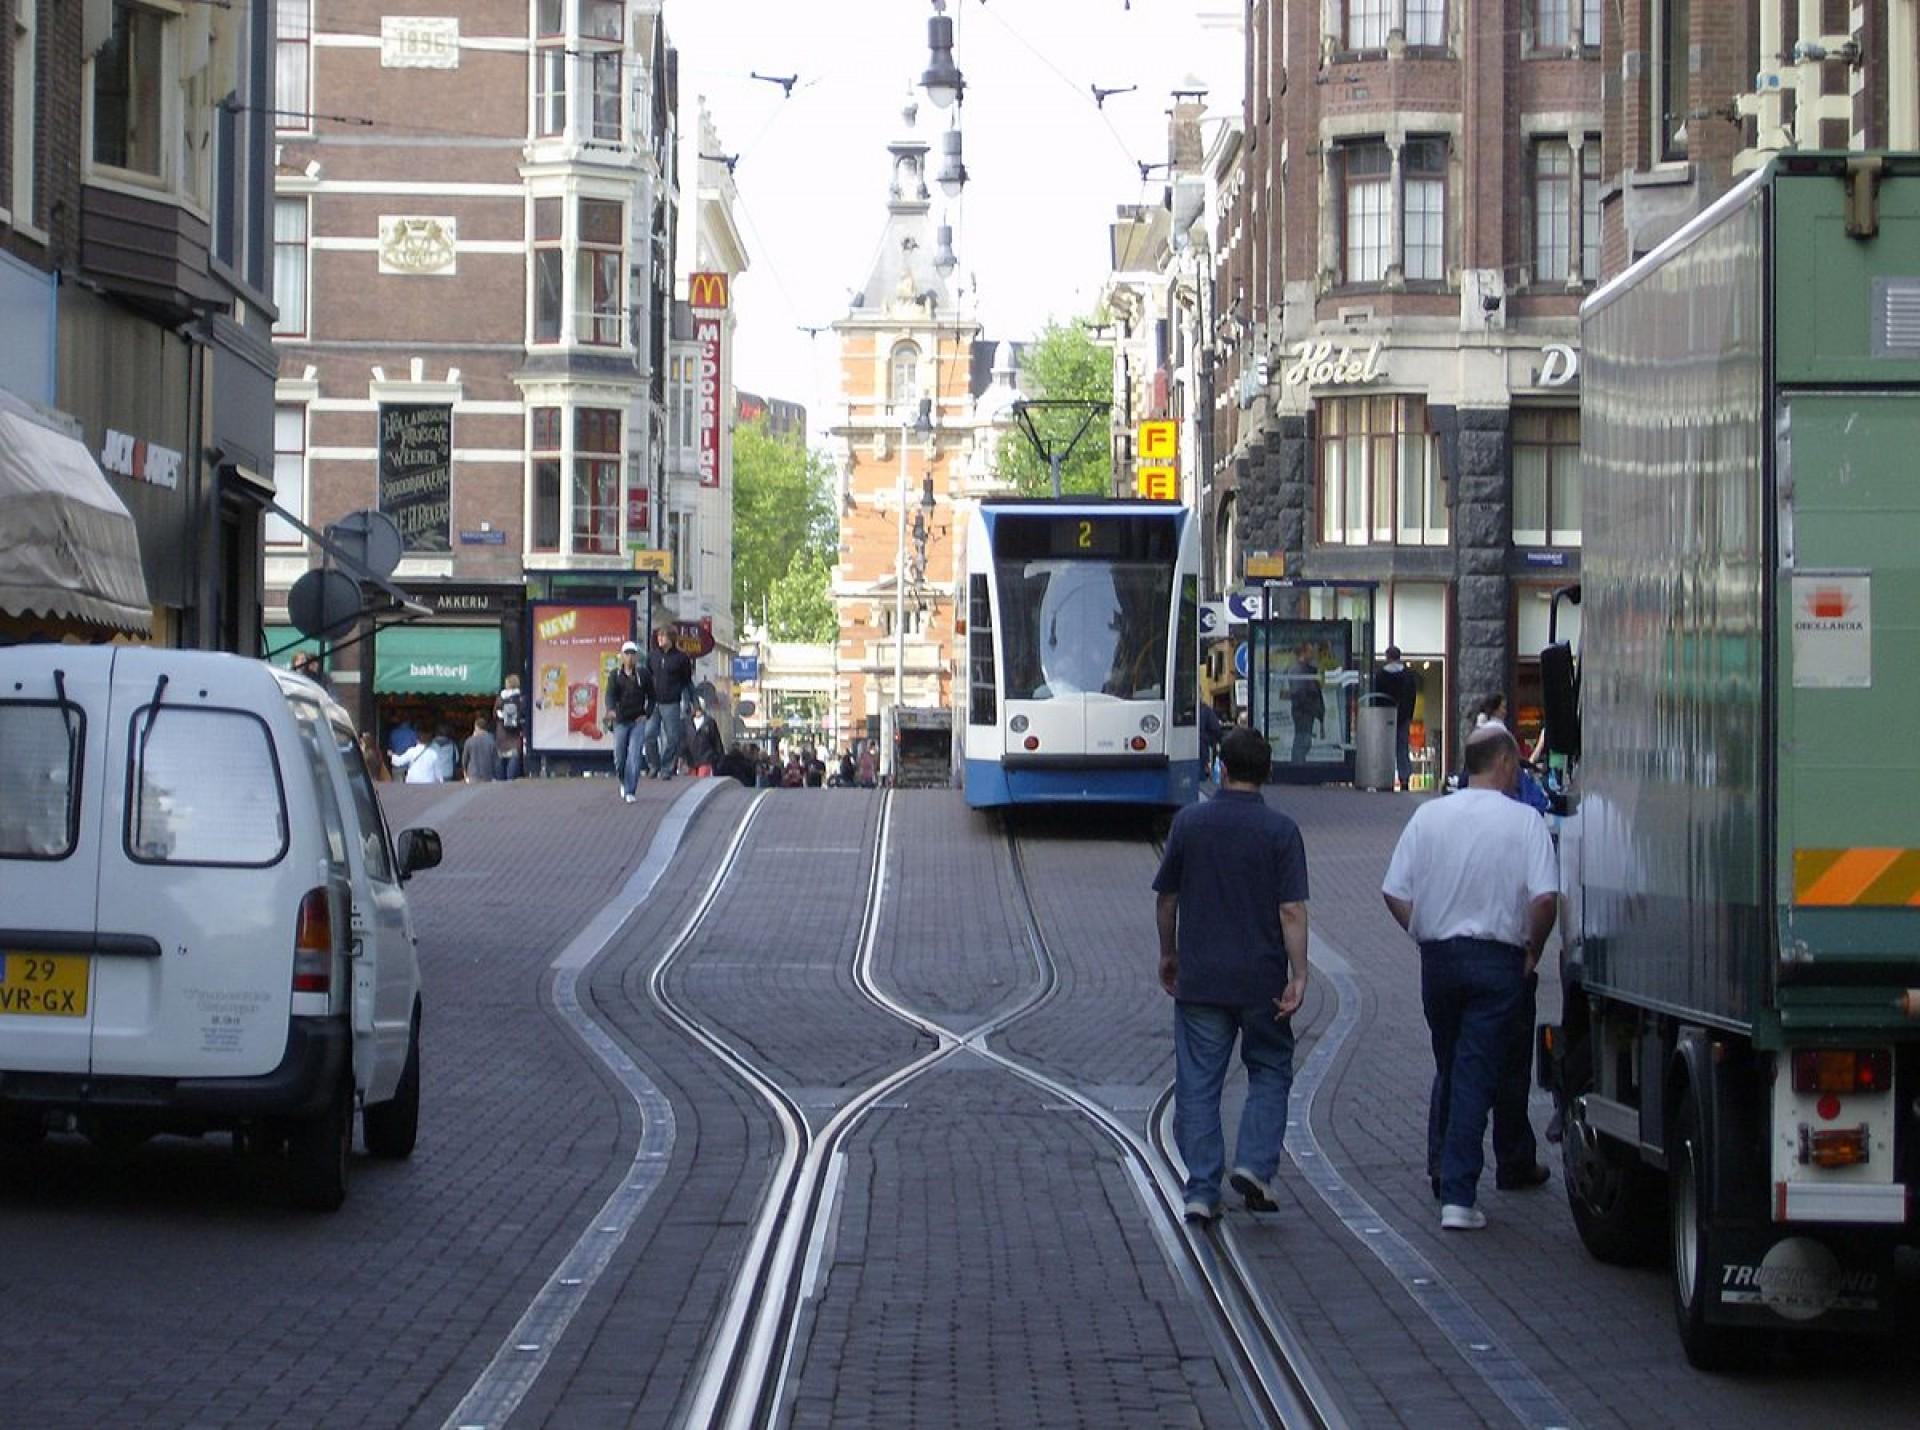 020 1200px Leidsestraat Met Tram Short Essay On Transportation Outstanding My Favourite Means Of Transport Public Water 1920